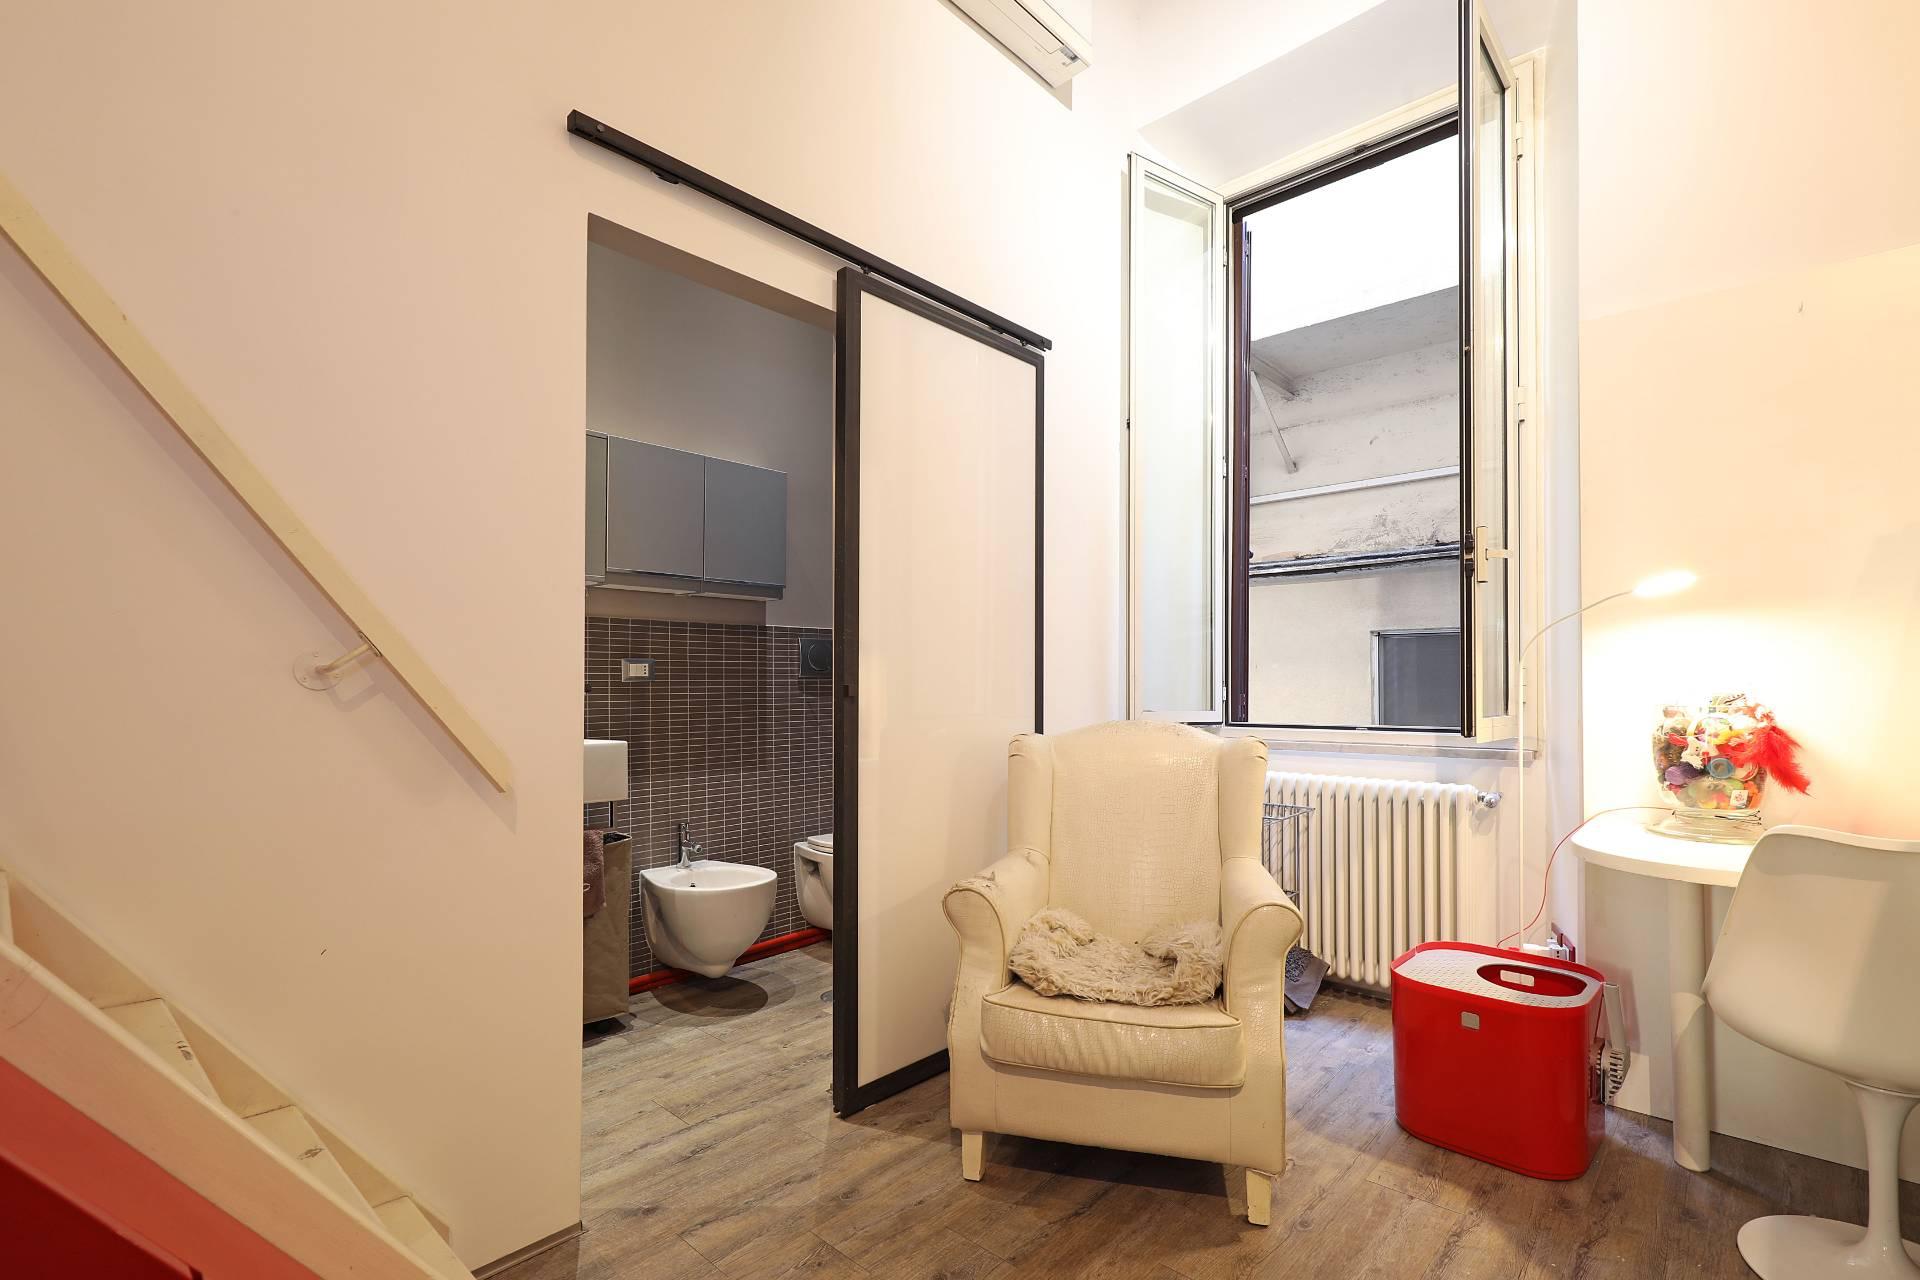 Cbi053 308 via manara appartamento in vendita a roma for Case in vendita roma trastevere